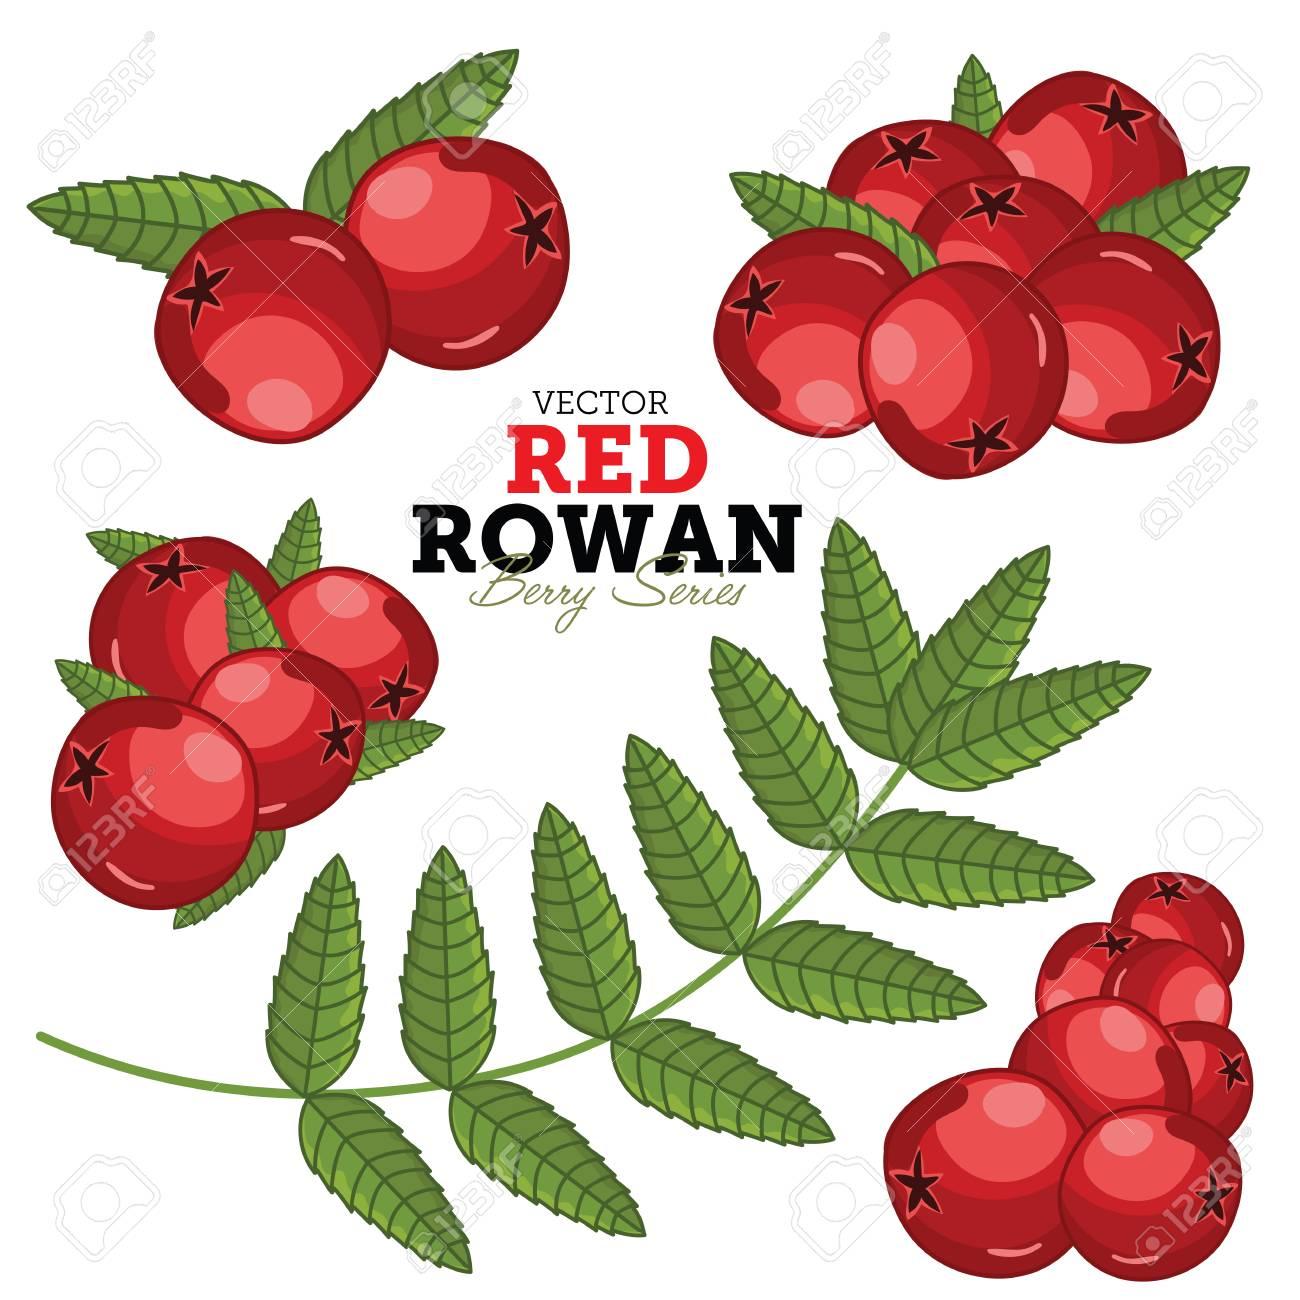 Rowan Compositions, Rowan Leaves, Rowan Vector, Cartoon illustration of Rowan. Rowan Isolated on White Background. Bunch of Juicy Rowan Berries. - 50794408